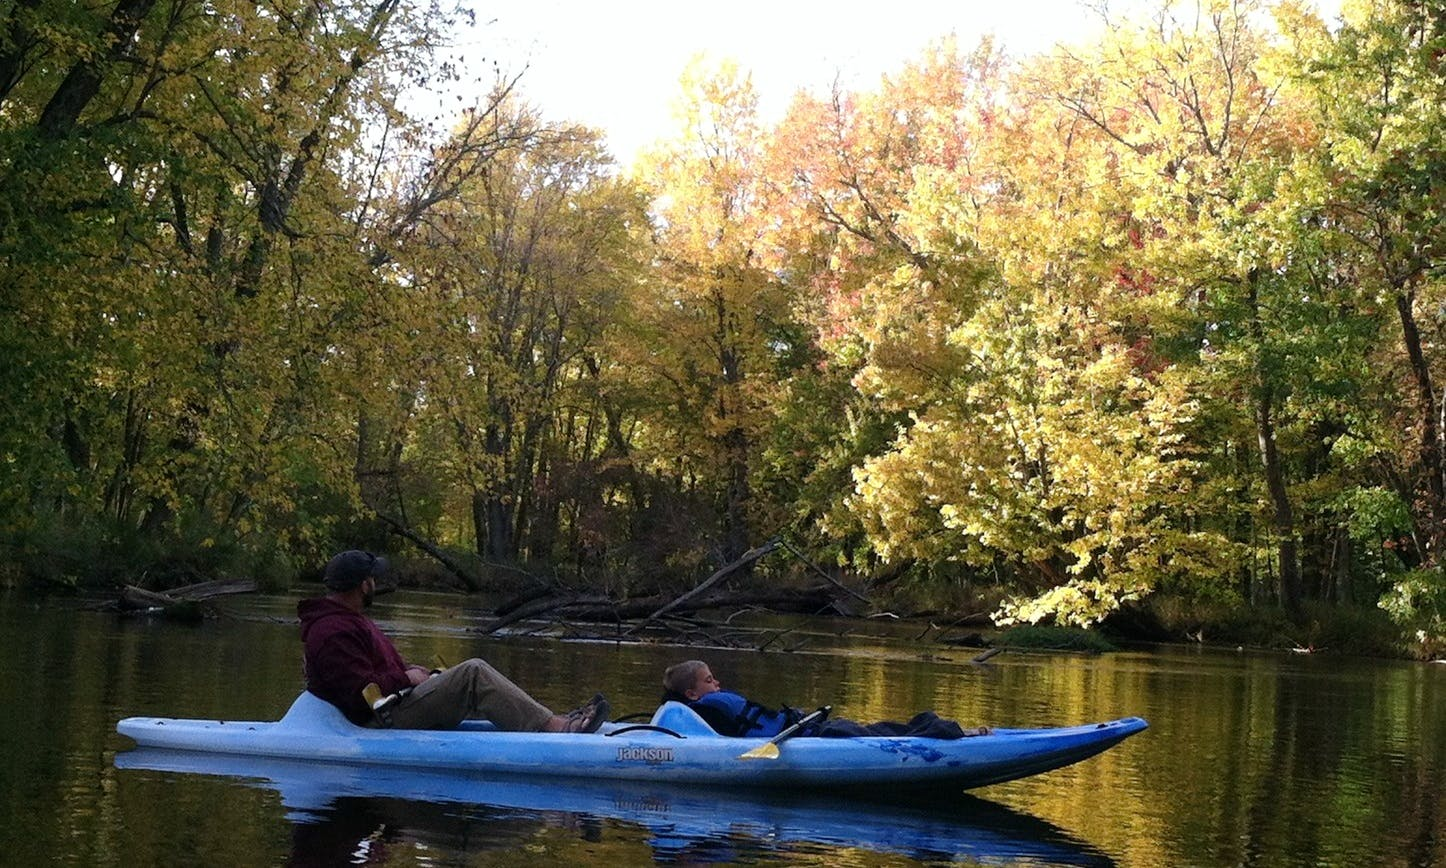 Kayak Rental in Scottville